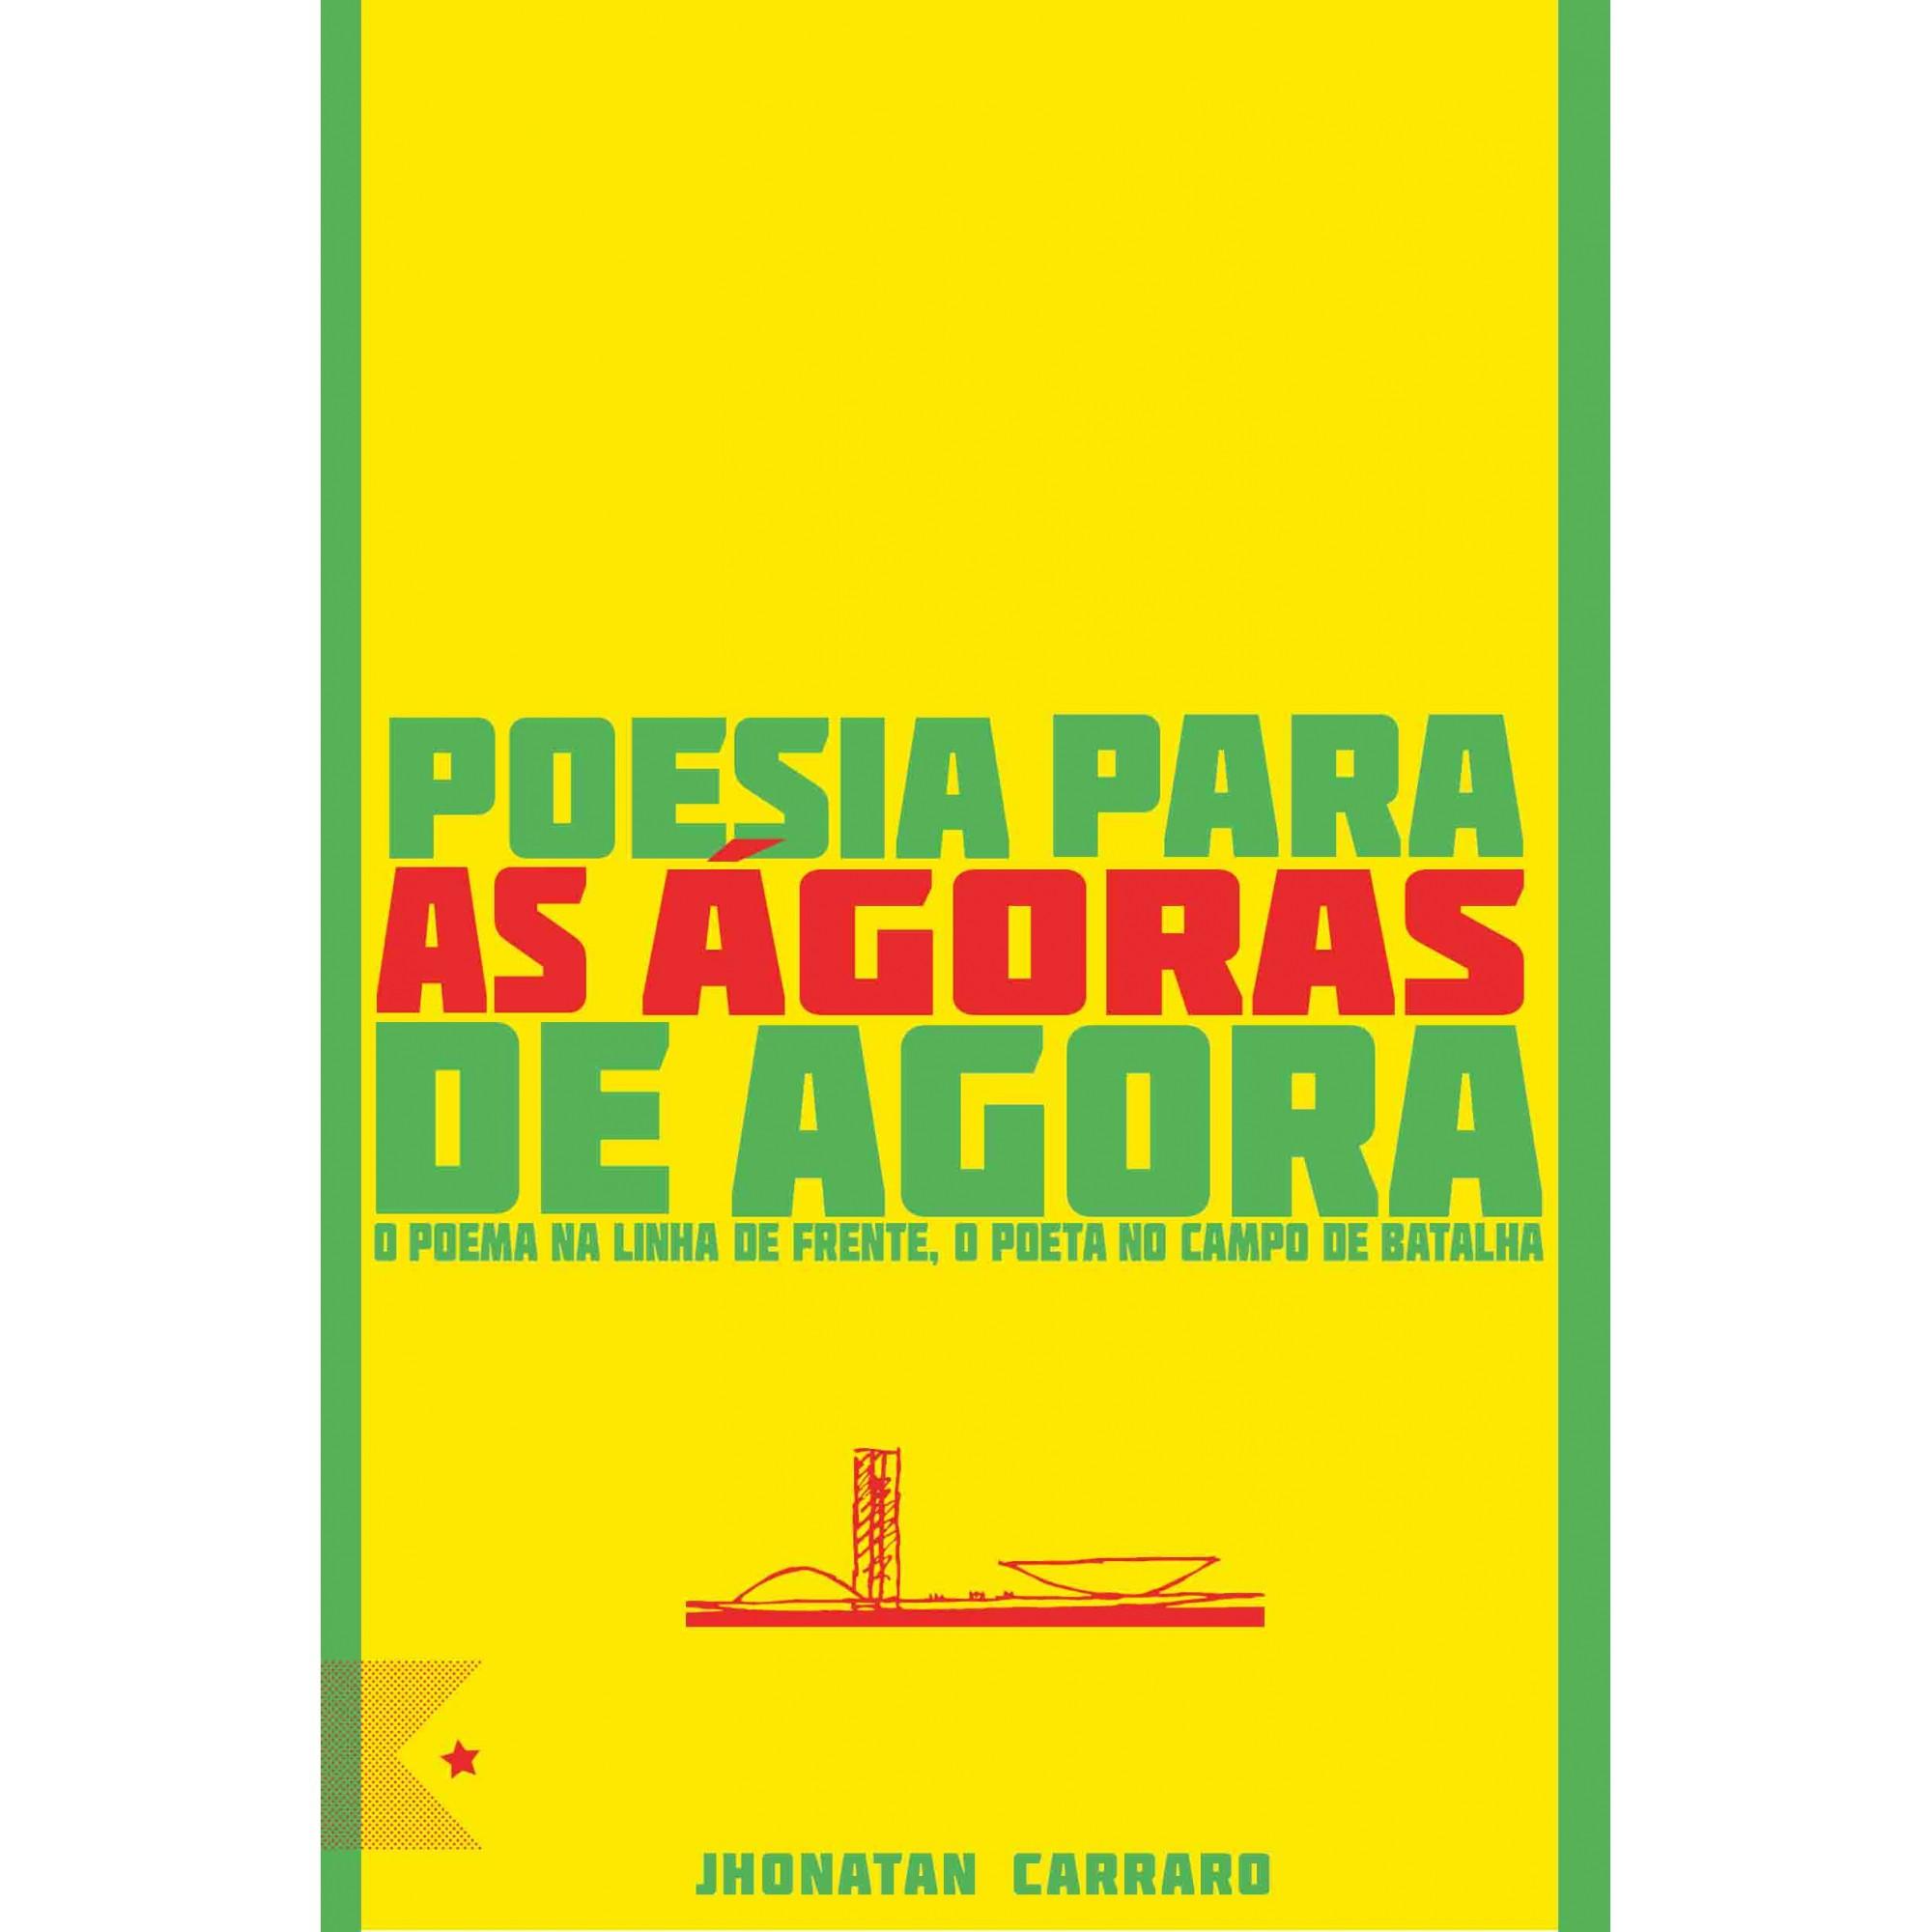 Ágoras de Agora, de Jhonatan Carraro - Pré-venda